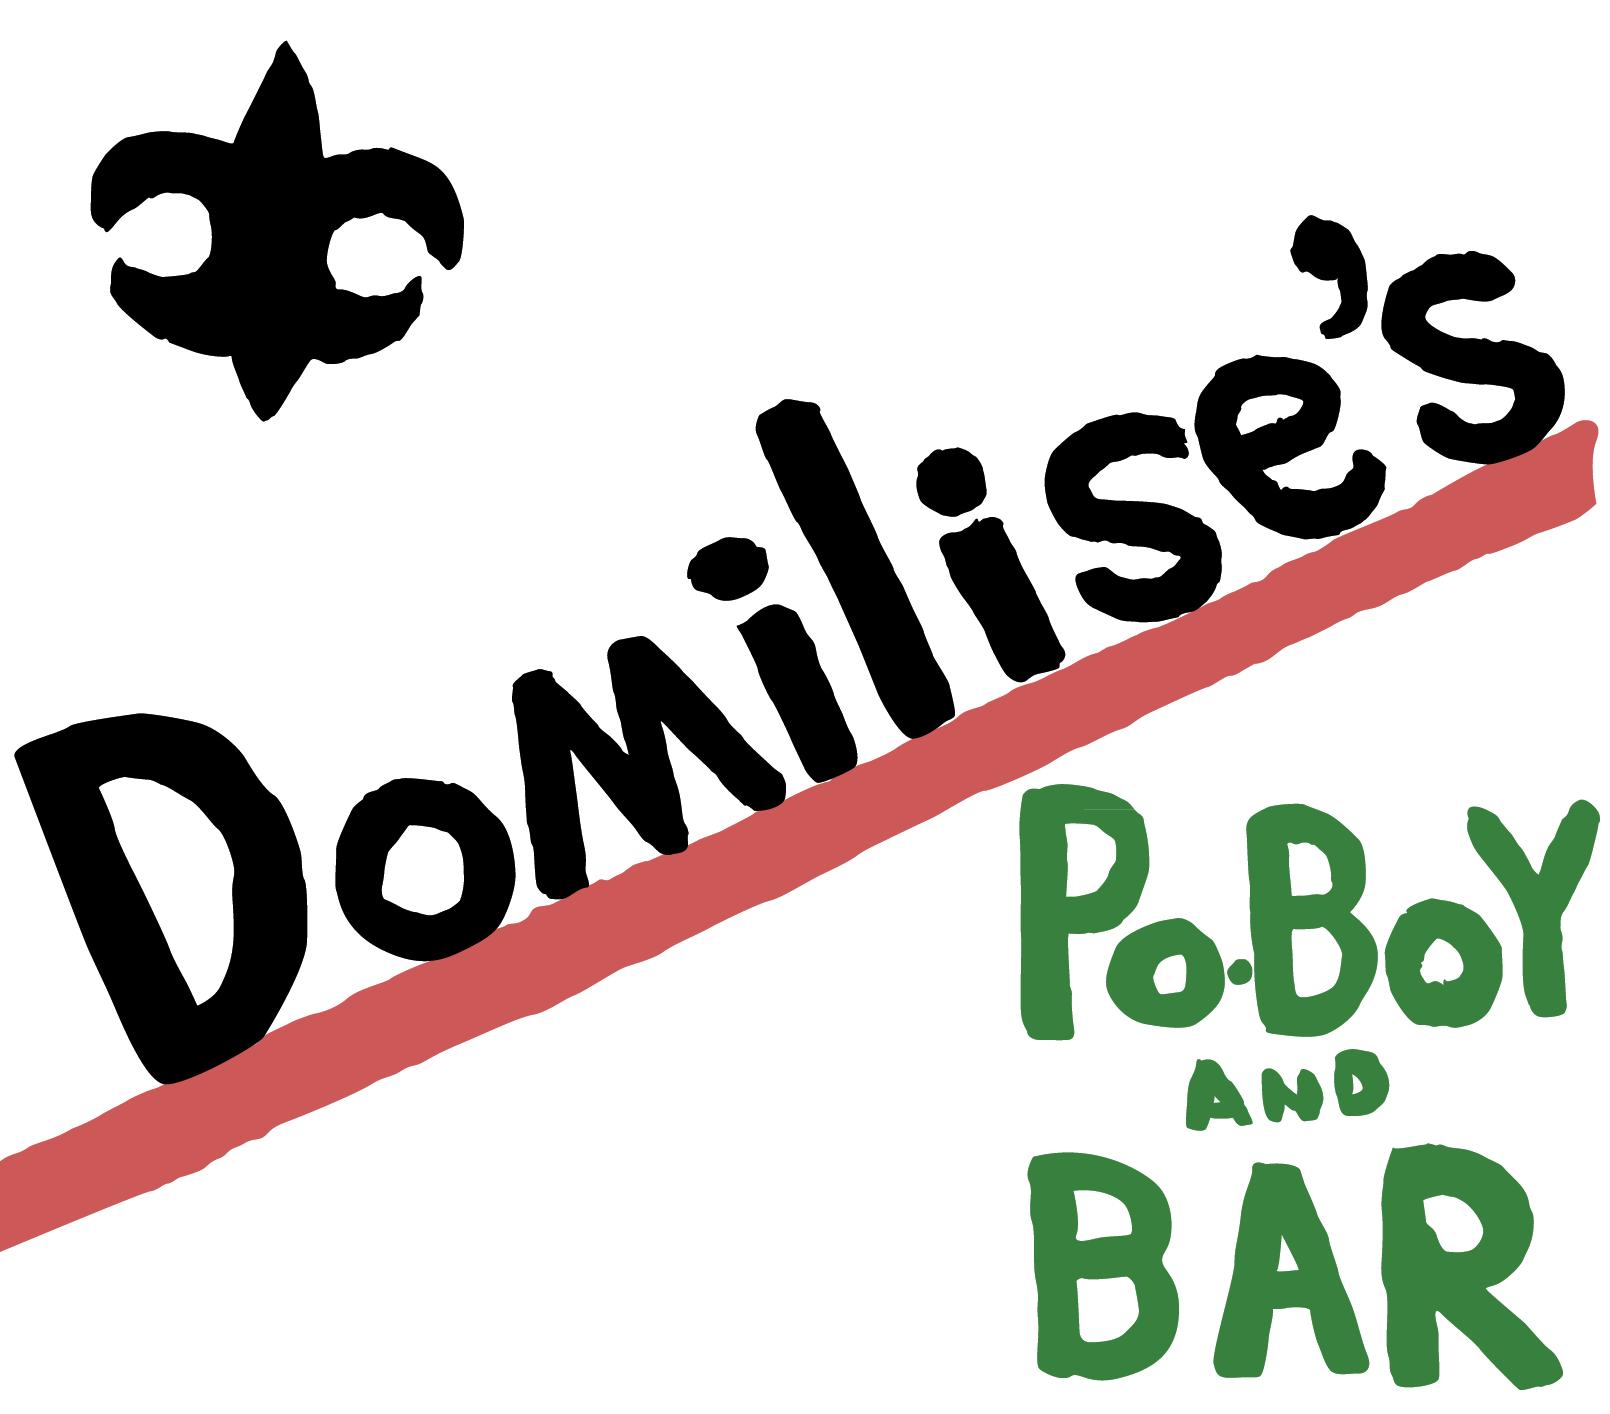 Domilise\'s Po-Boy & Bar | Serving Classic New Orleans Po-Boys for ...